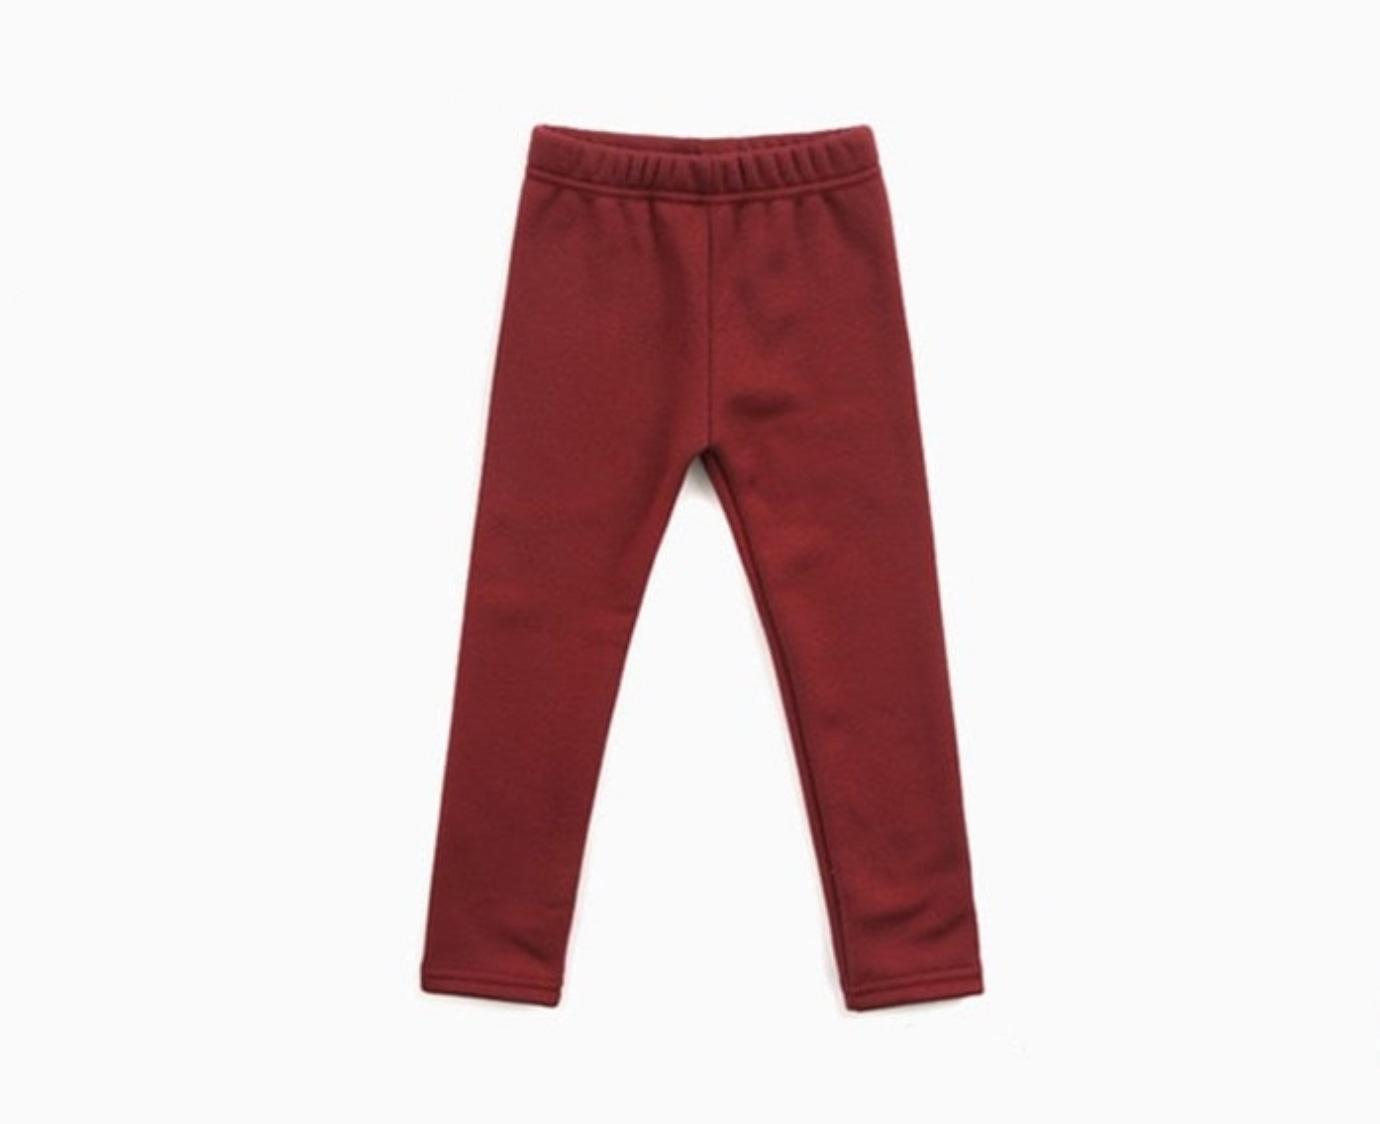 Legging 'Winter red'